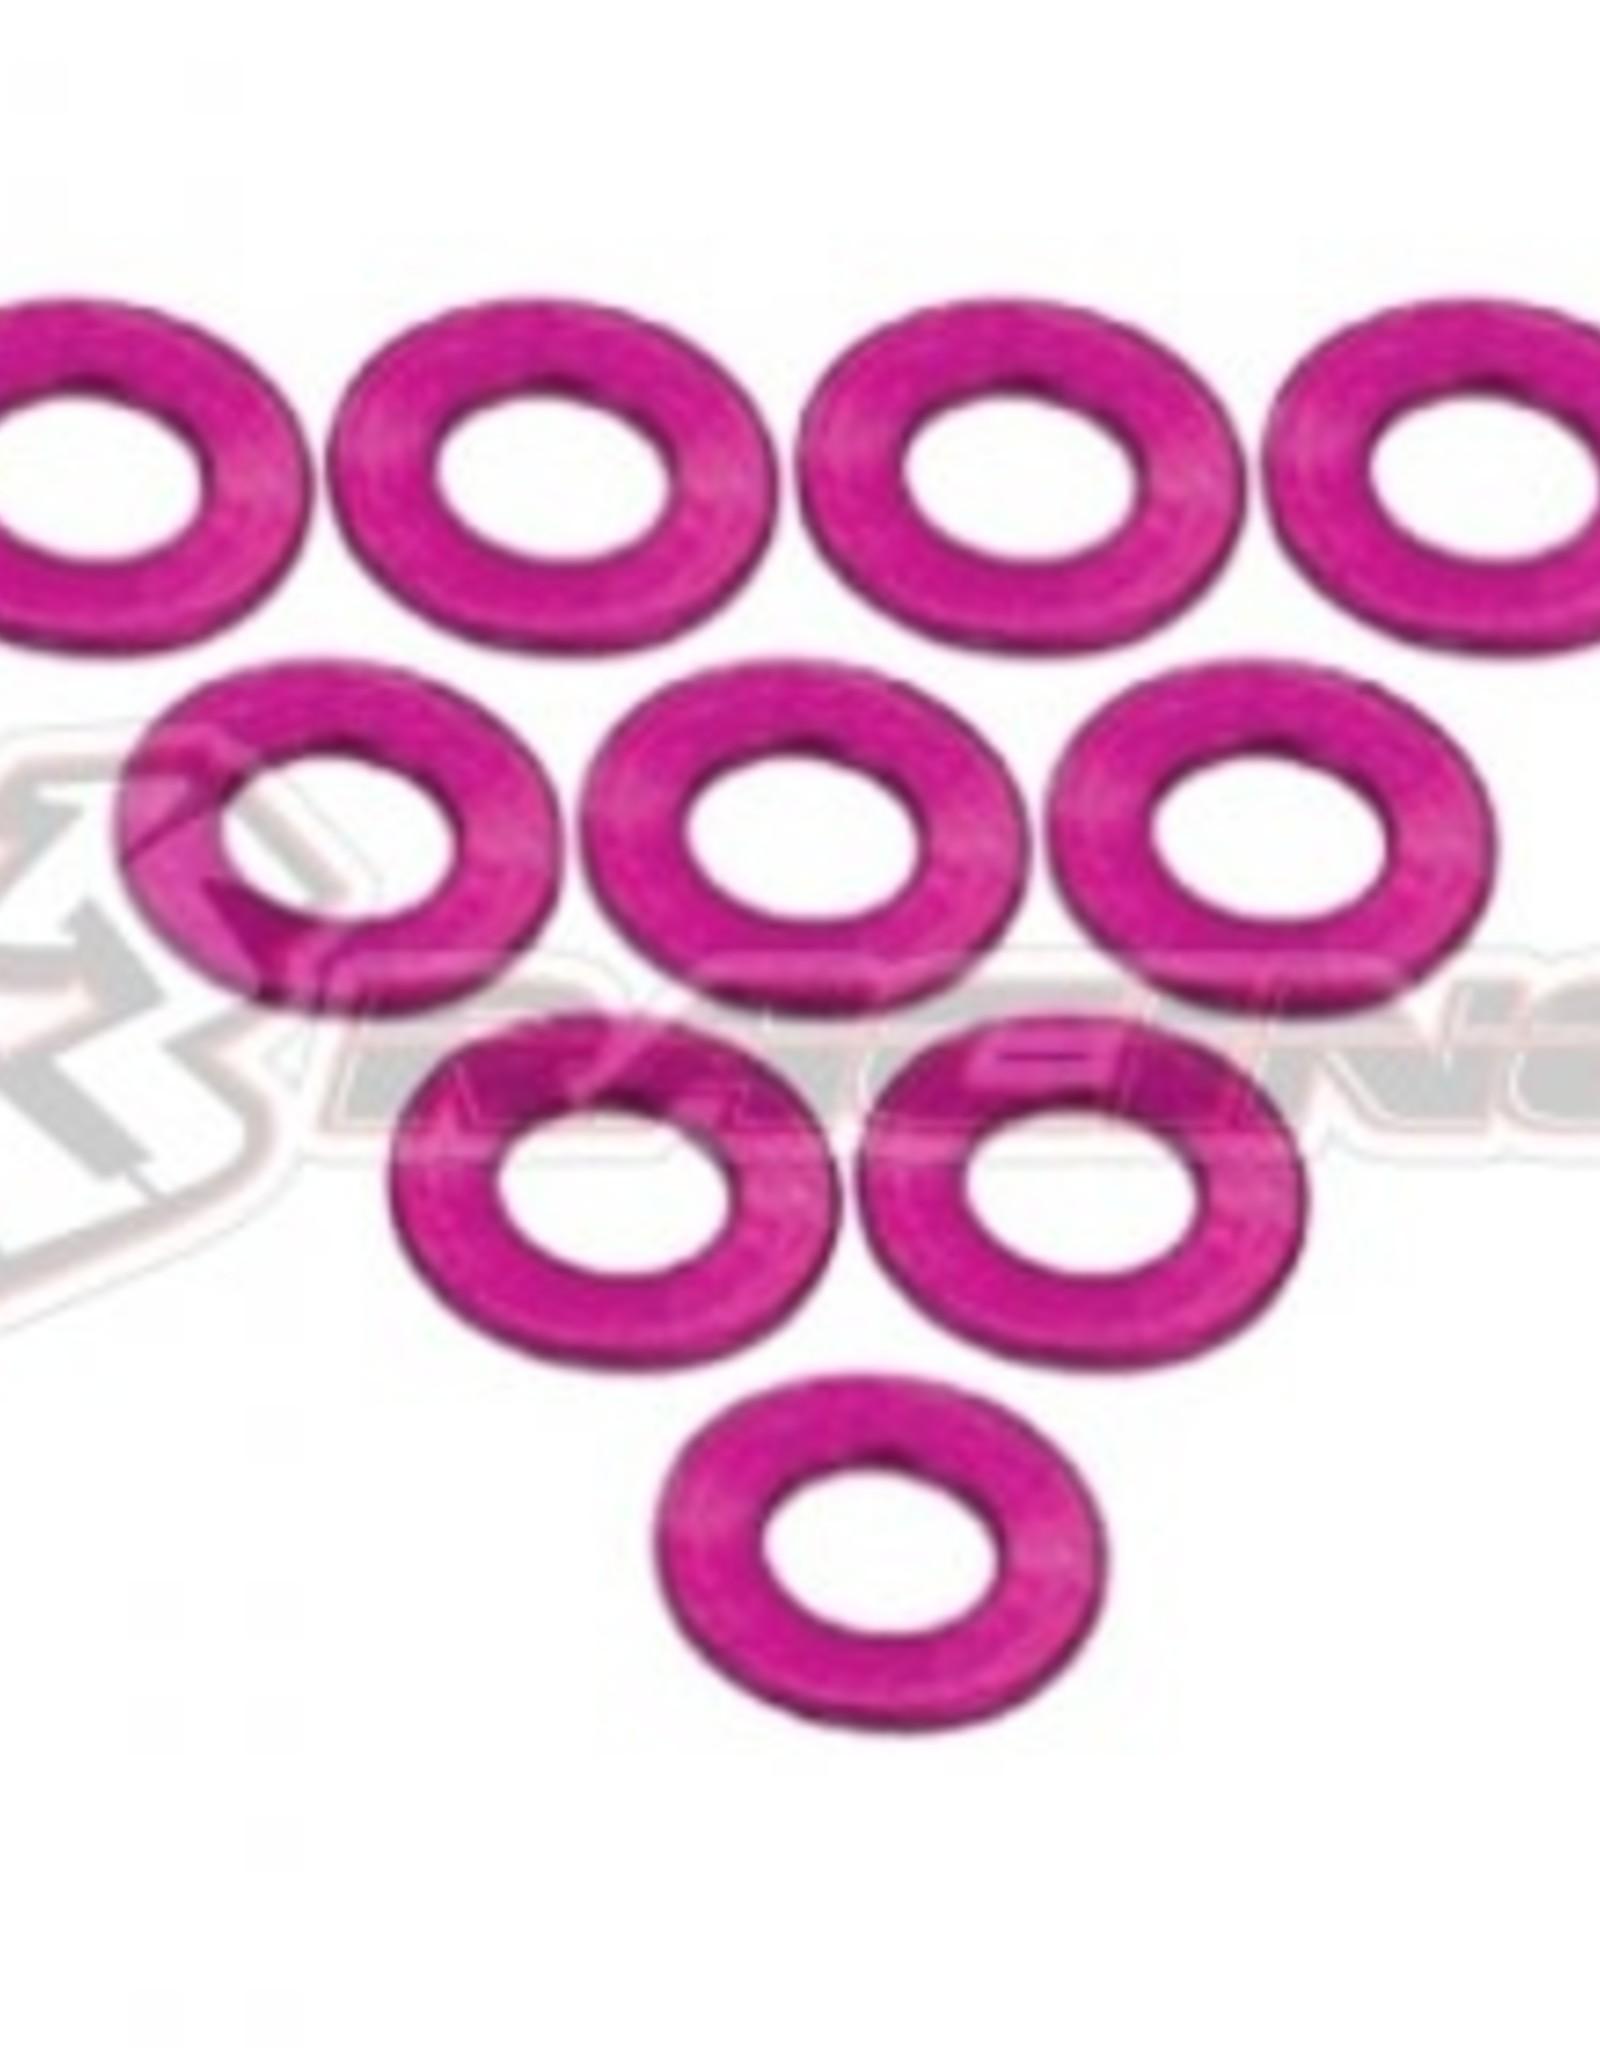 3Racing 3RAC-WF305/PK - Aluminium M3 Flat Washer 0.5mm 10 Pcs Pink - 3Racing